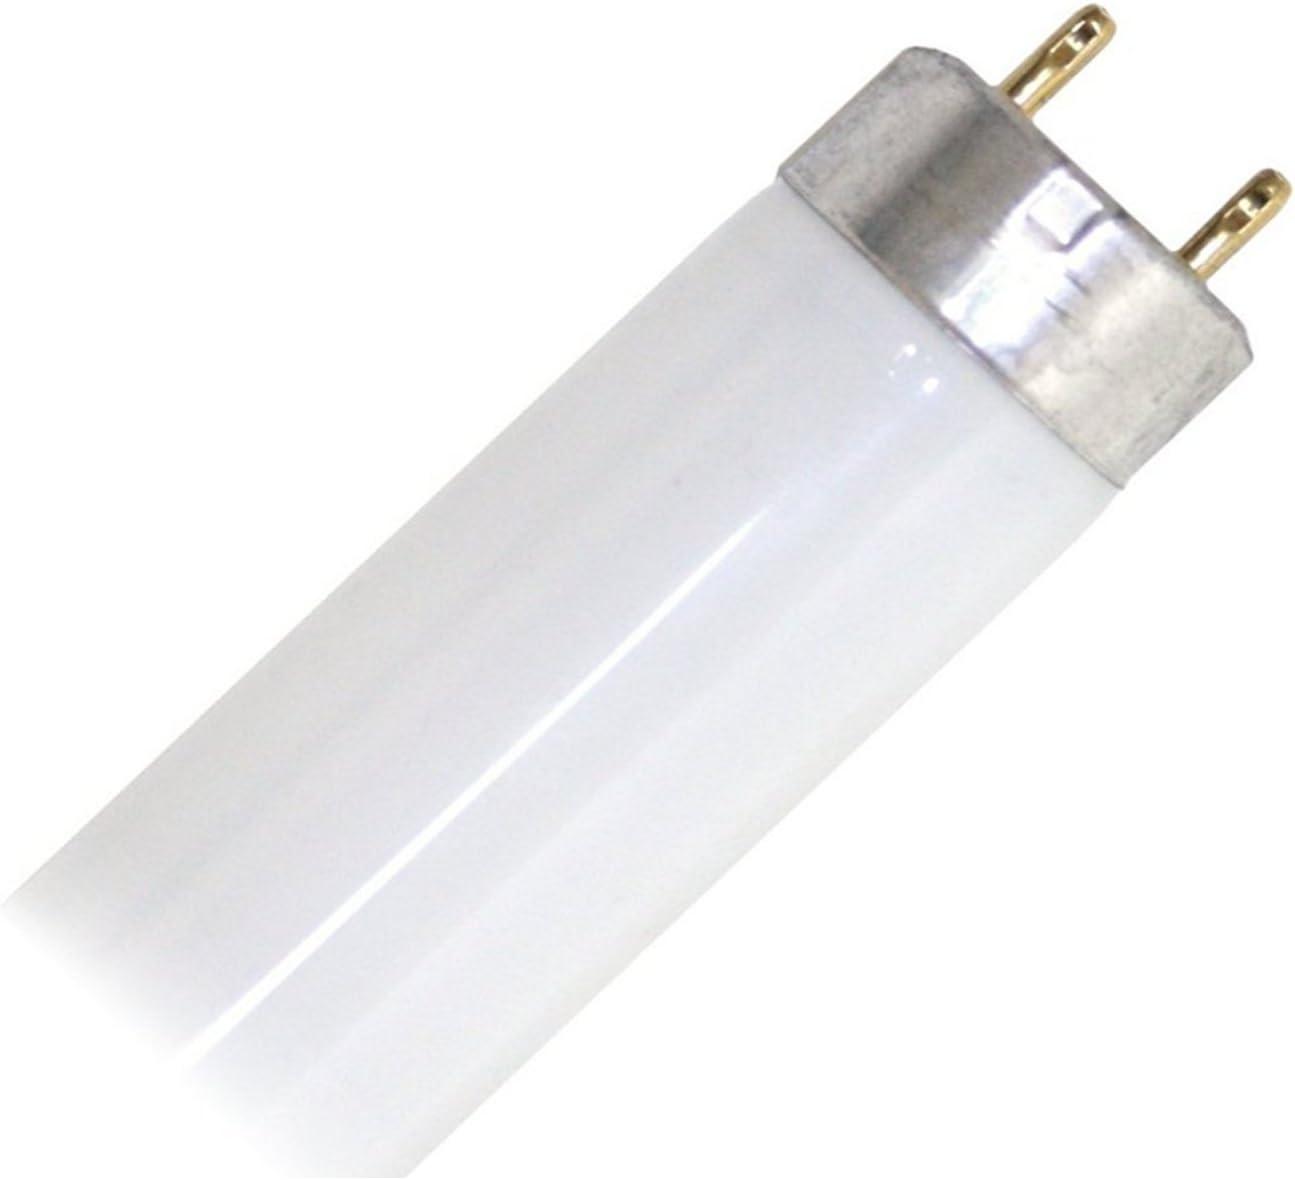 4100K Replaces Philips F15T8//COOL White PLUS//18 Alto F15T8//CW//ALTO F15T8//CW//ECO GE F15T8//SP41 F15T8//CW 15 Watt T8 Fluorescent Tube Light Bulb Cool White